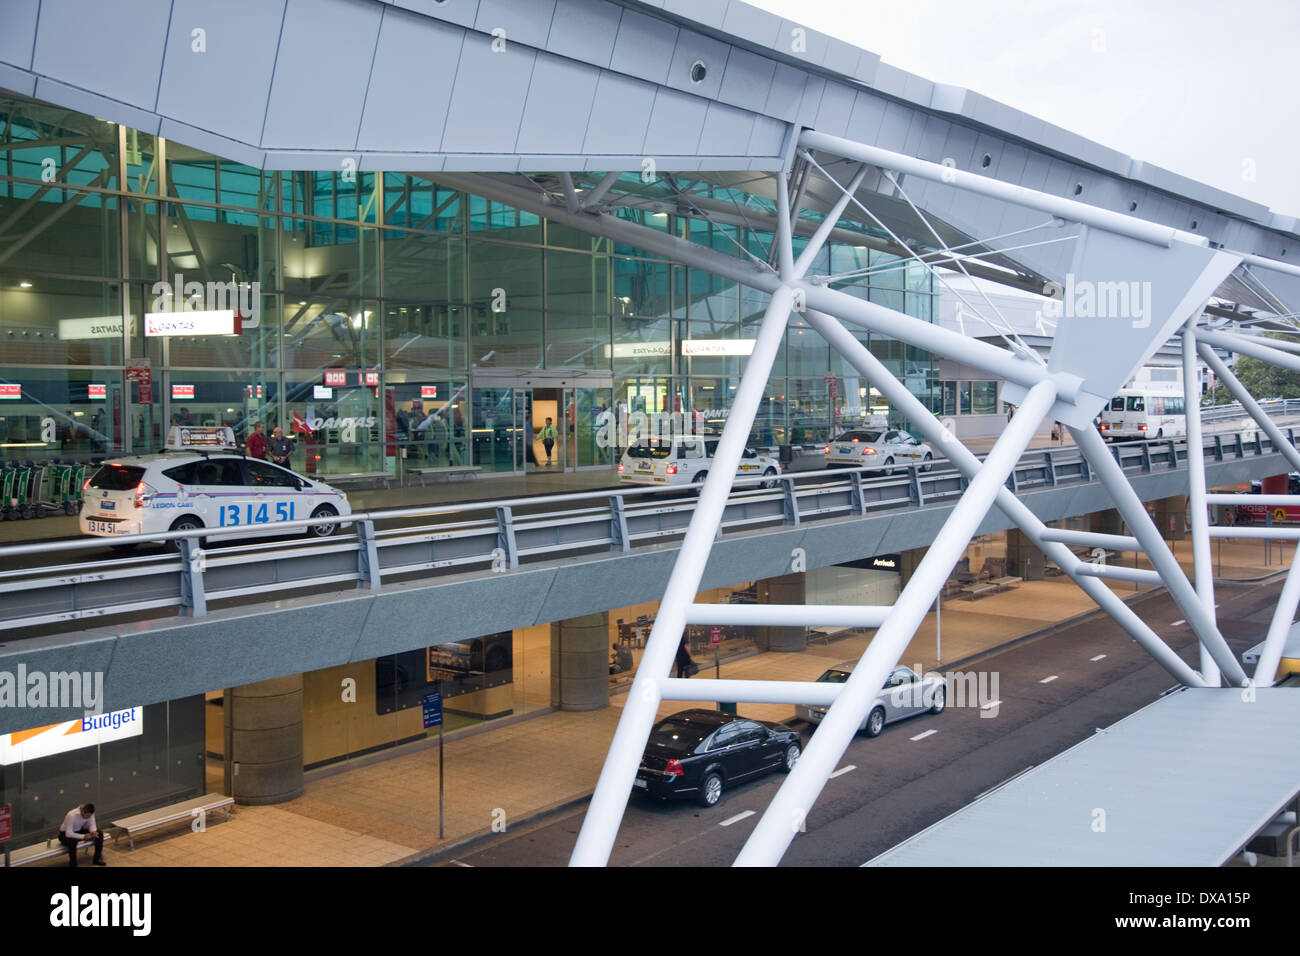 sydney airport terminal building Stock Photo